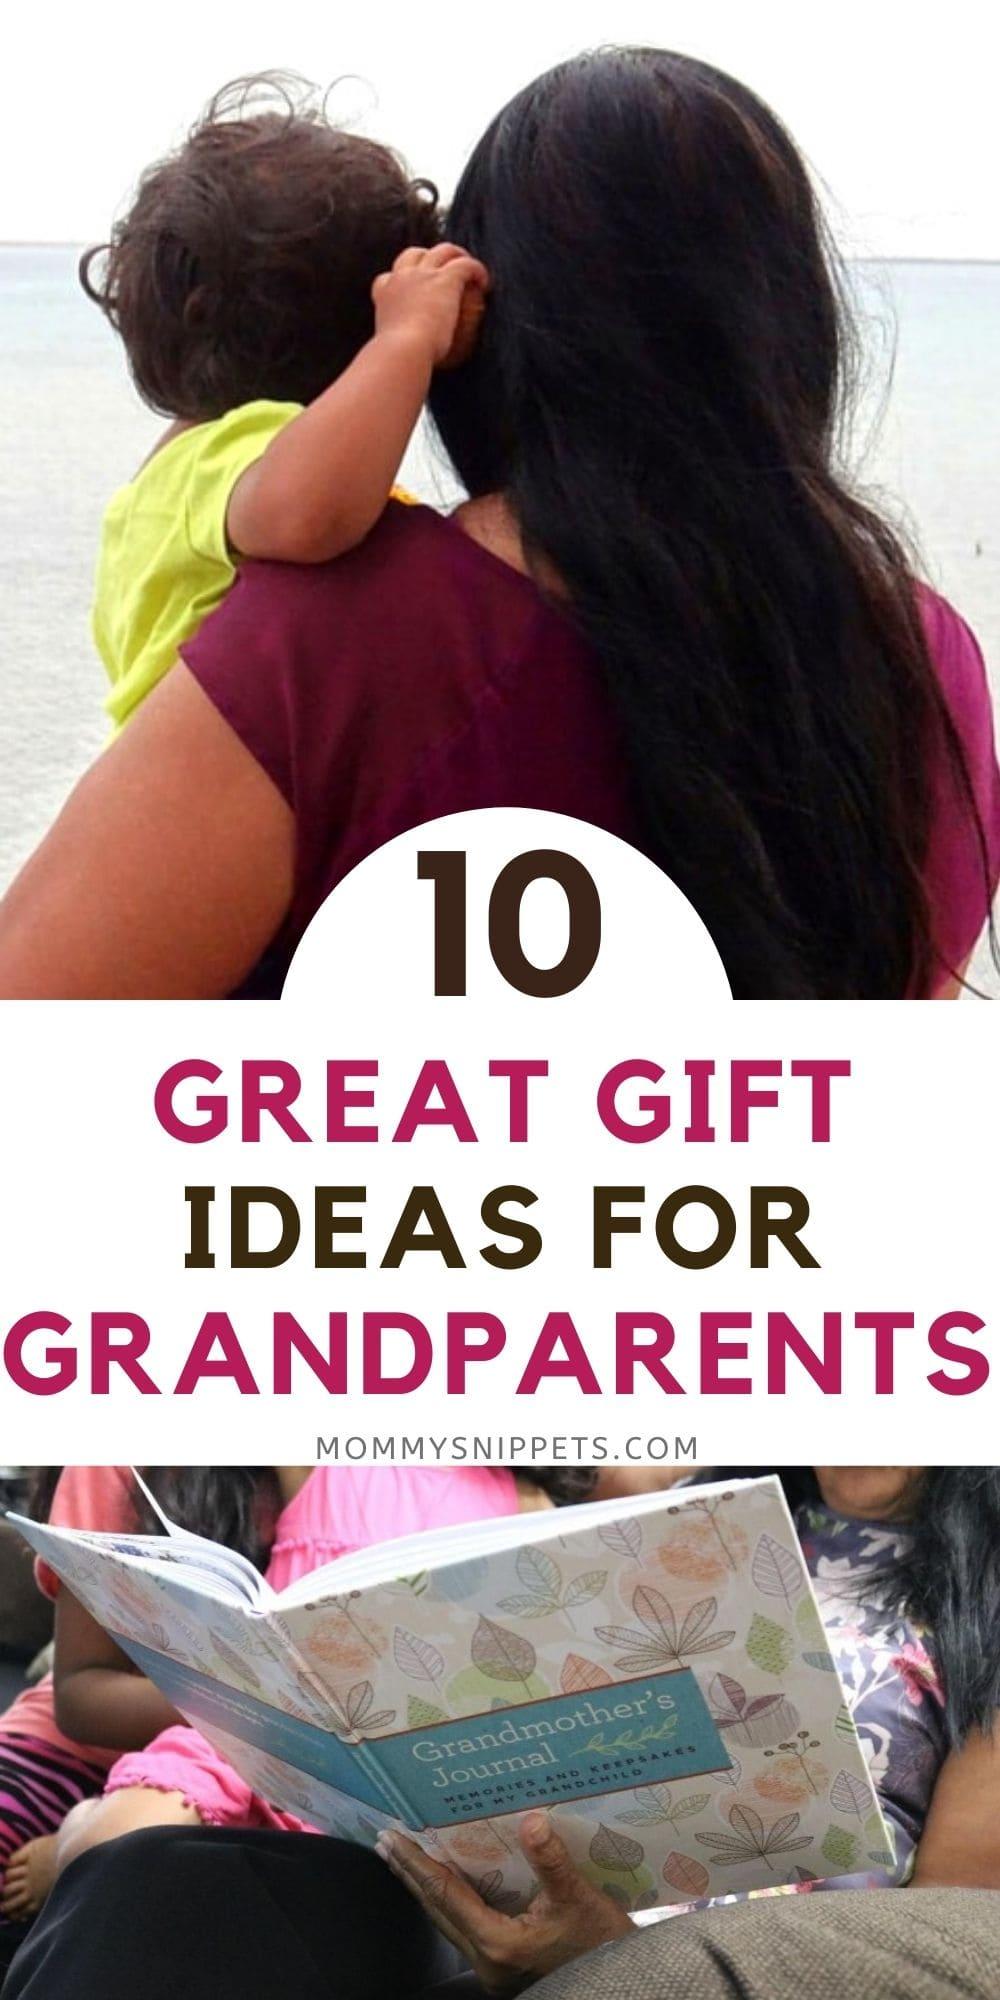 10 Ideas for Grandparents Day Gifts Grandpa and Grandma will love